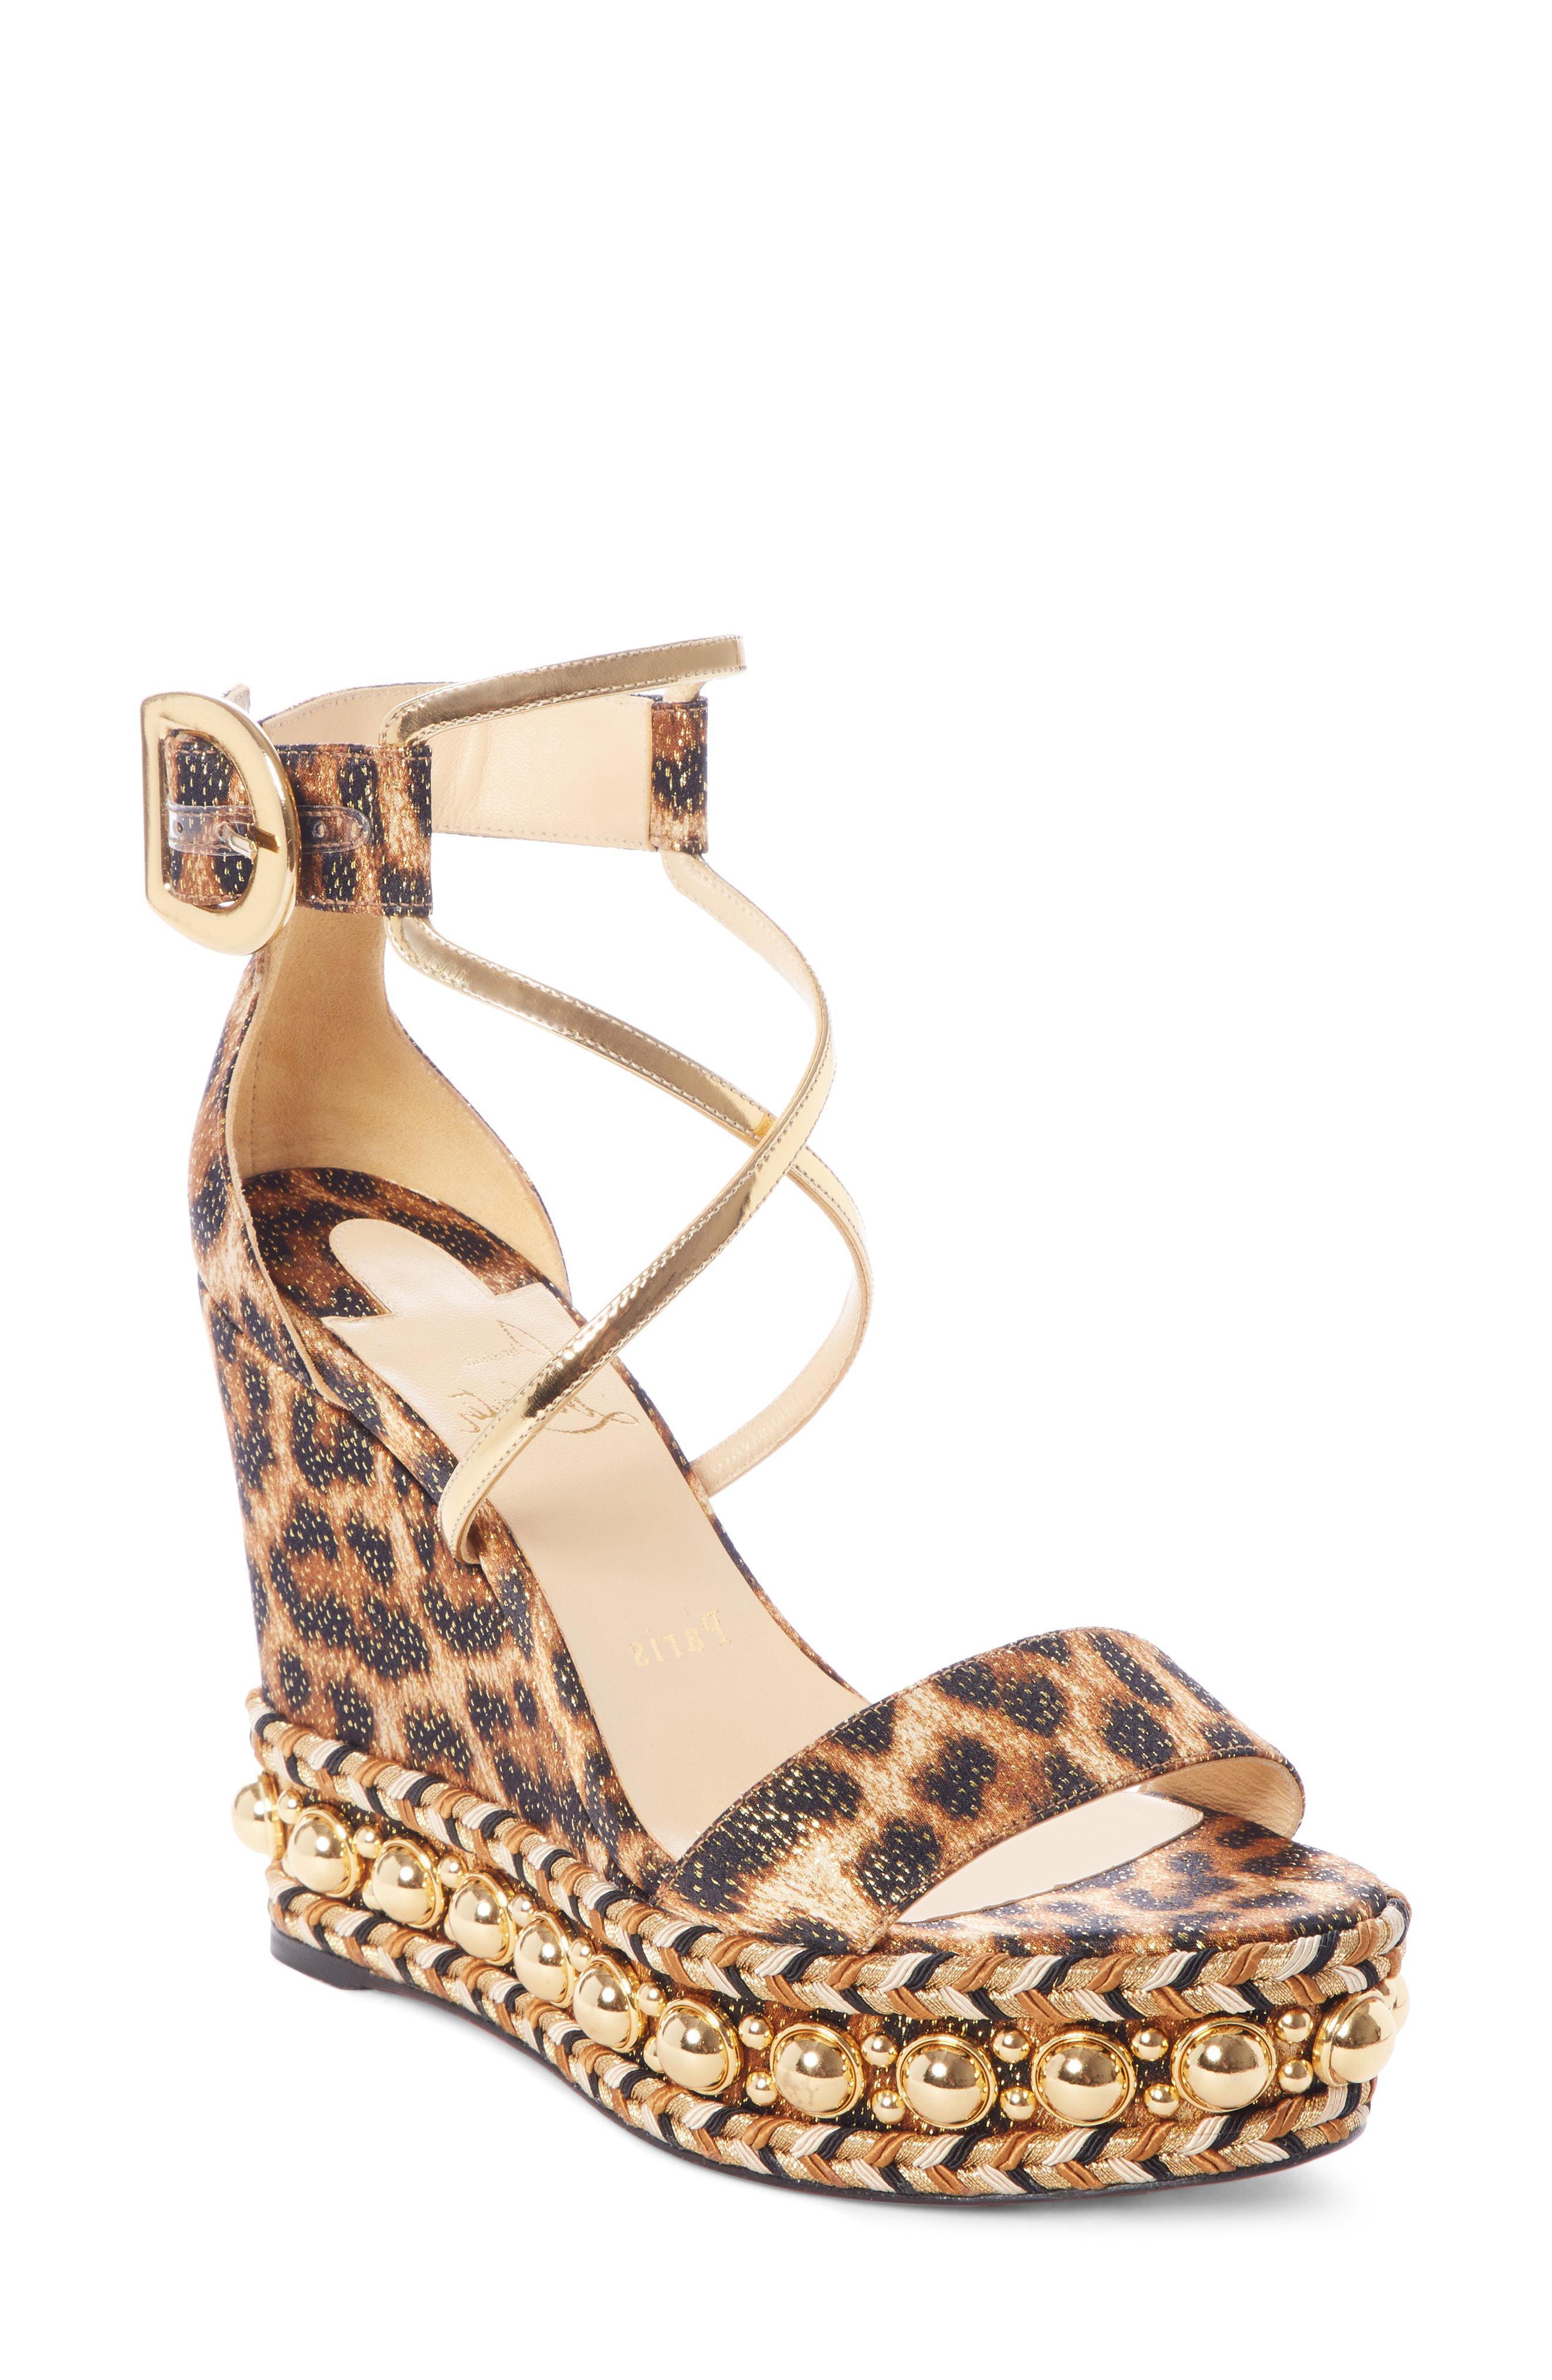 ab26eadd01e7 Christian Louboutin. Women s Chocazeppa Ornament Platform Wedge Sandal